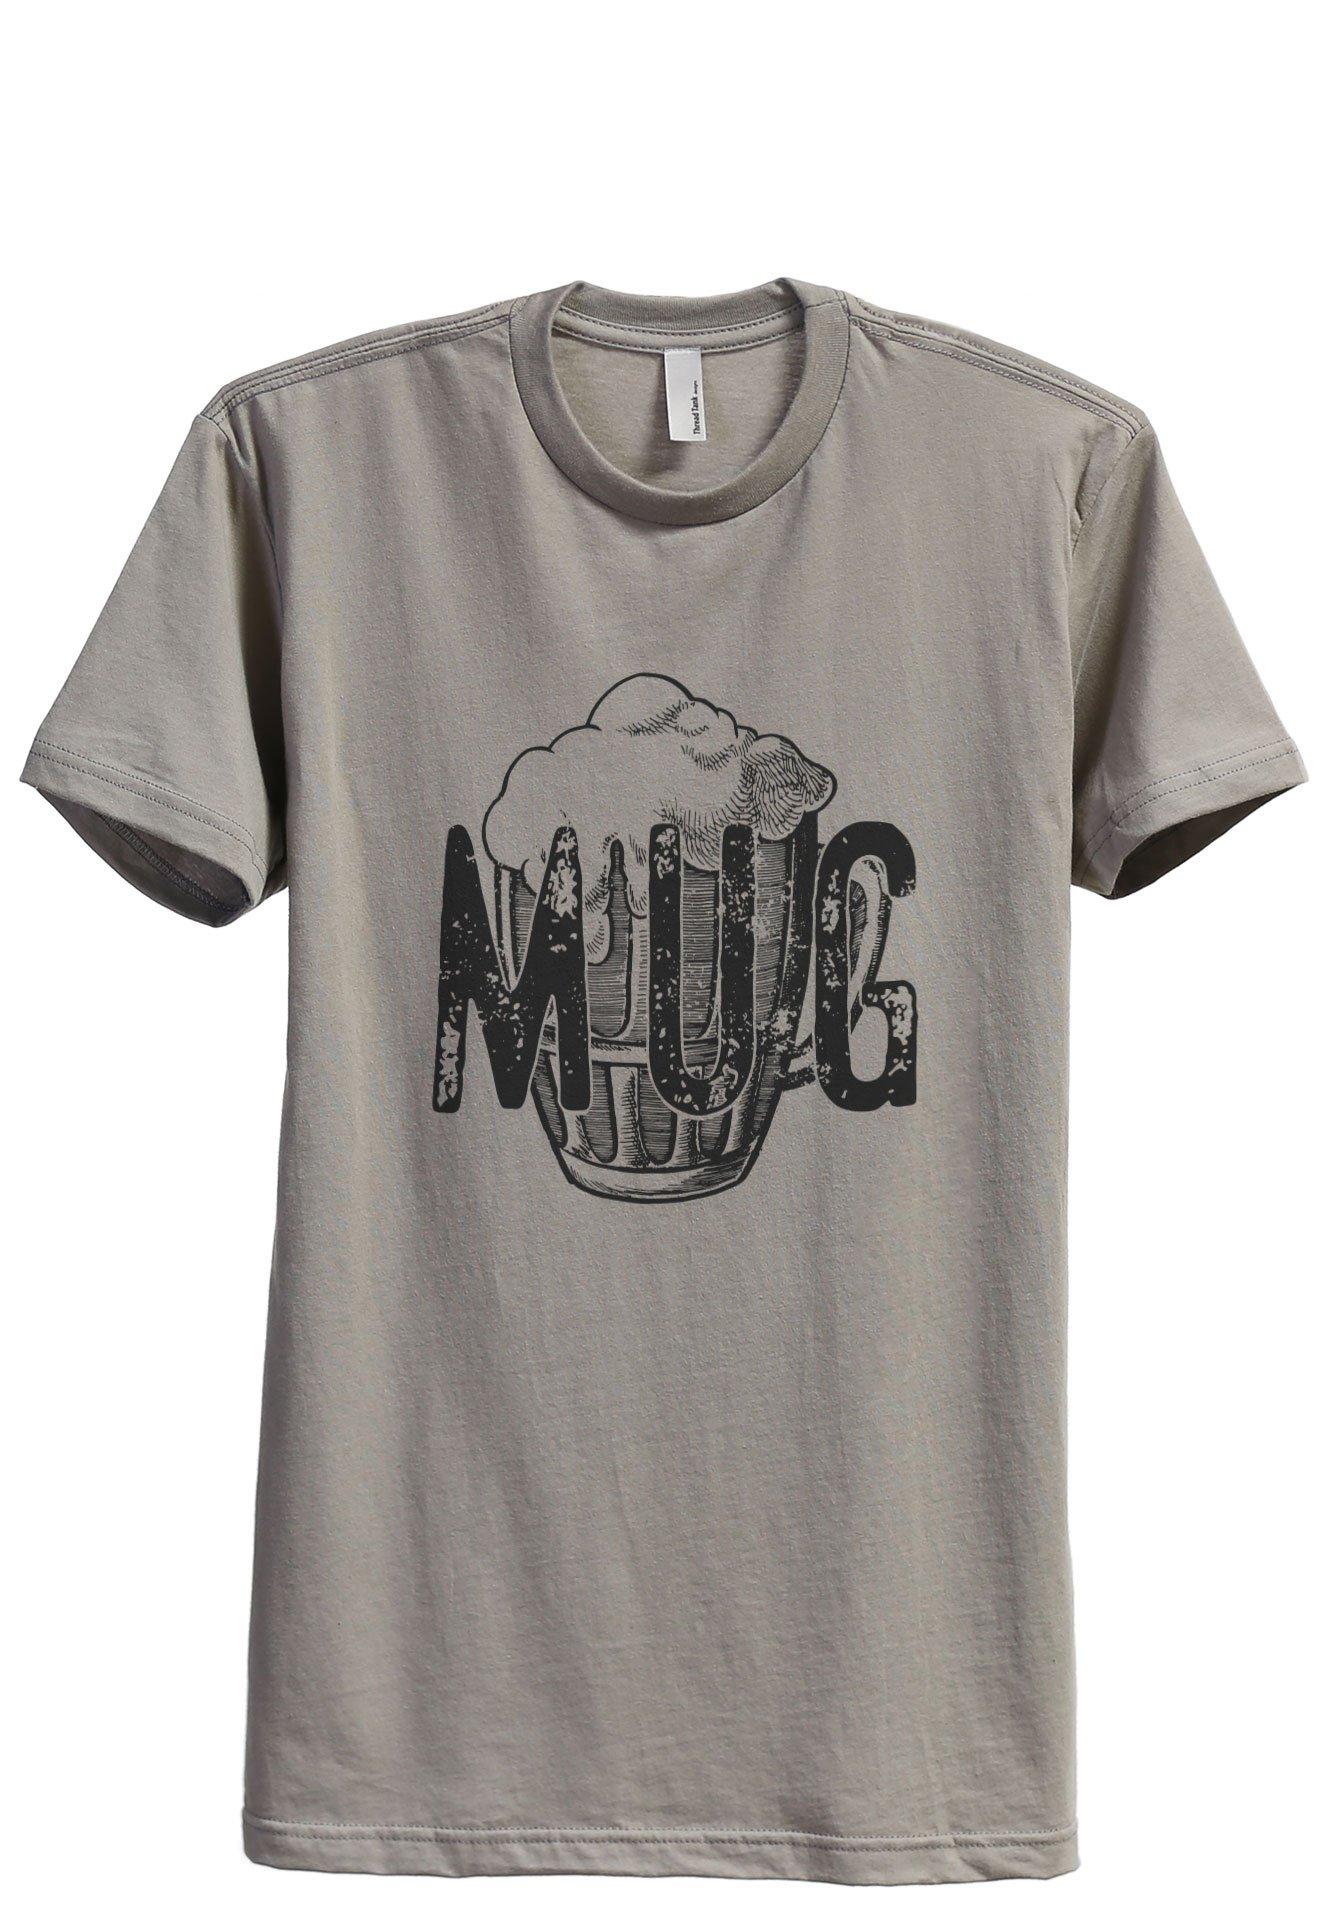 Thread Tank Mug Glass Sketch Men's Modern Fit T-Shirt Printed Graphic Tee Military Grey Large